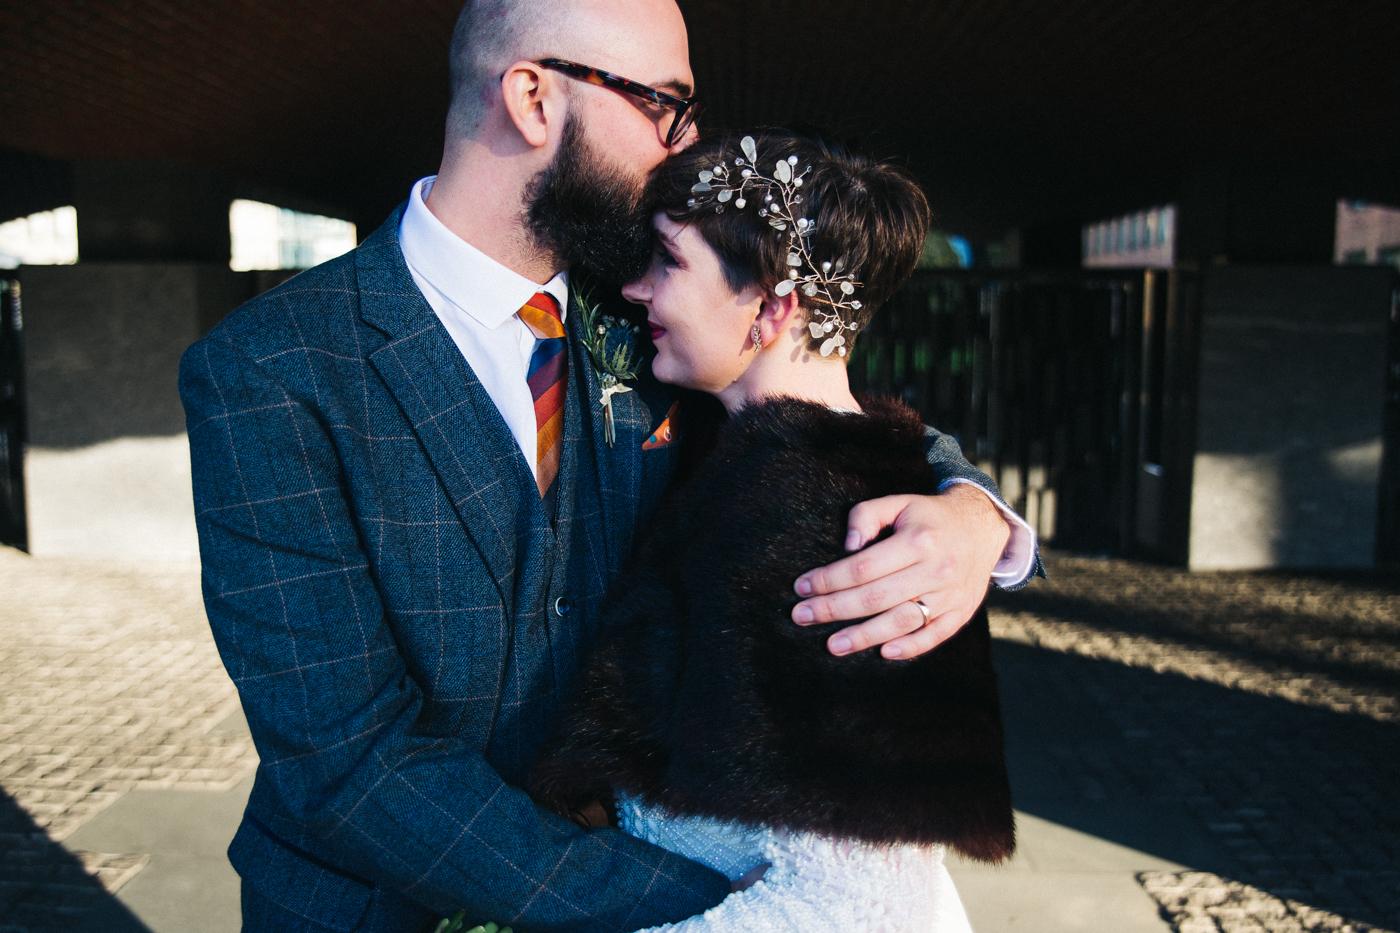 teesside-newcastle-gateshead-wedding-photography-photographer-creative-0050.jpg